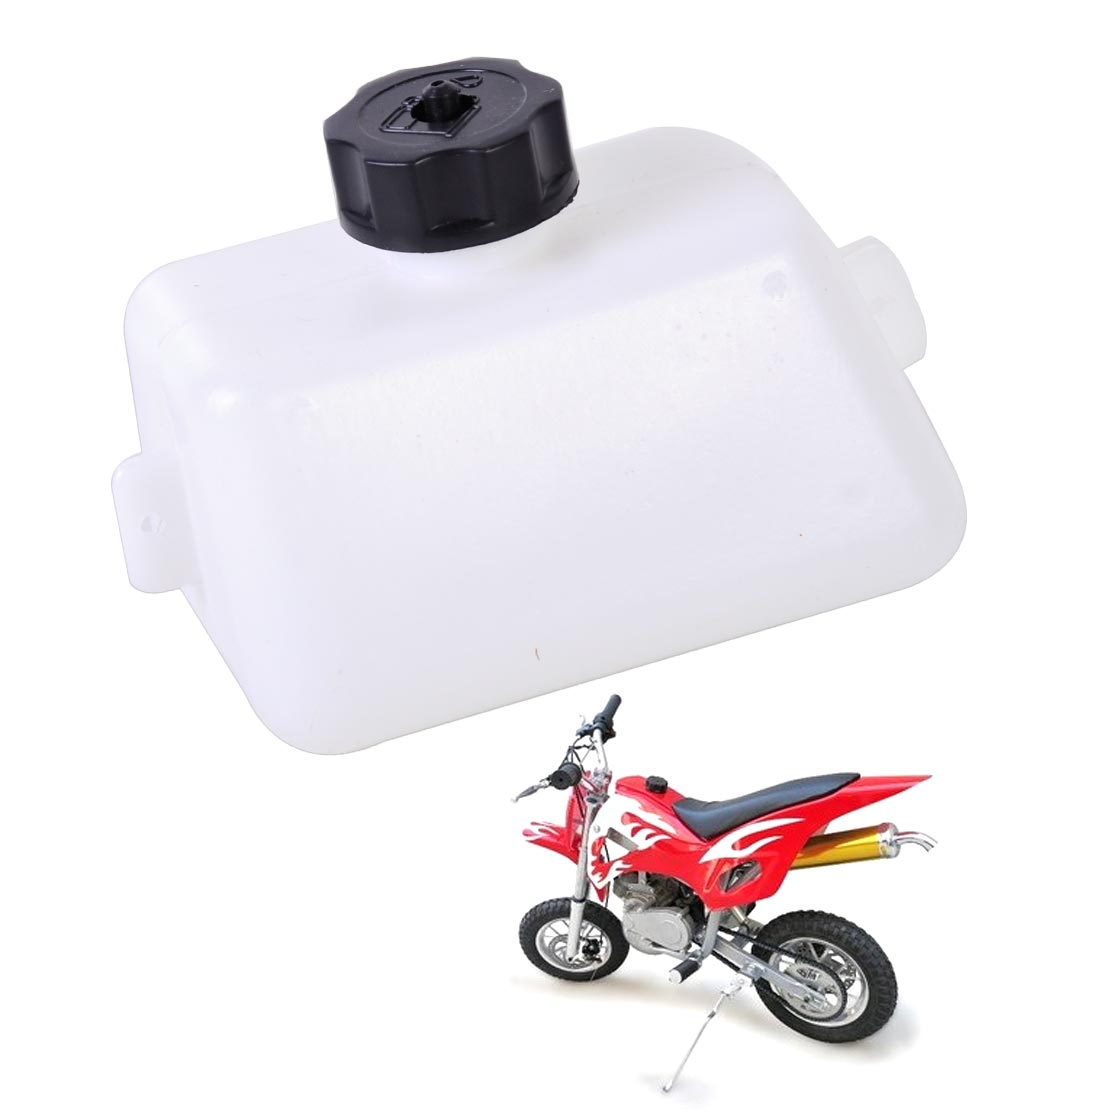 Plastic Fuel Tank >> Dwcx New Motorcycle White Plastic Gas Fuel Tank Fit For 2 Stroke